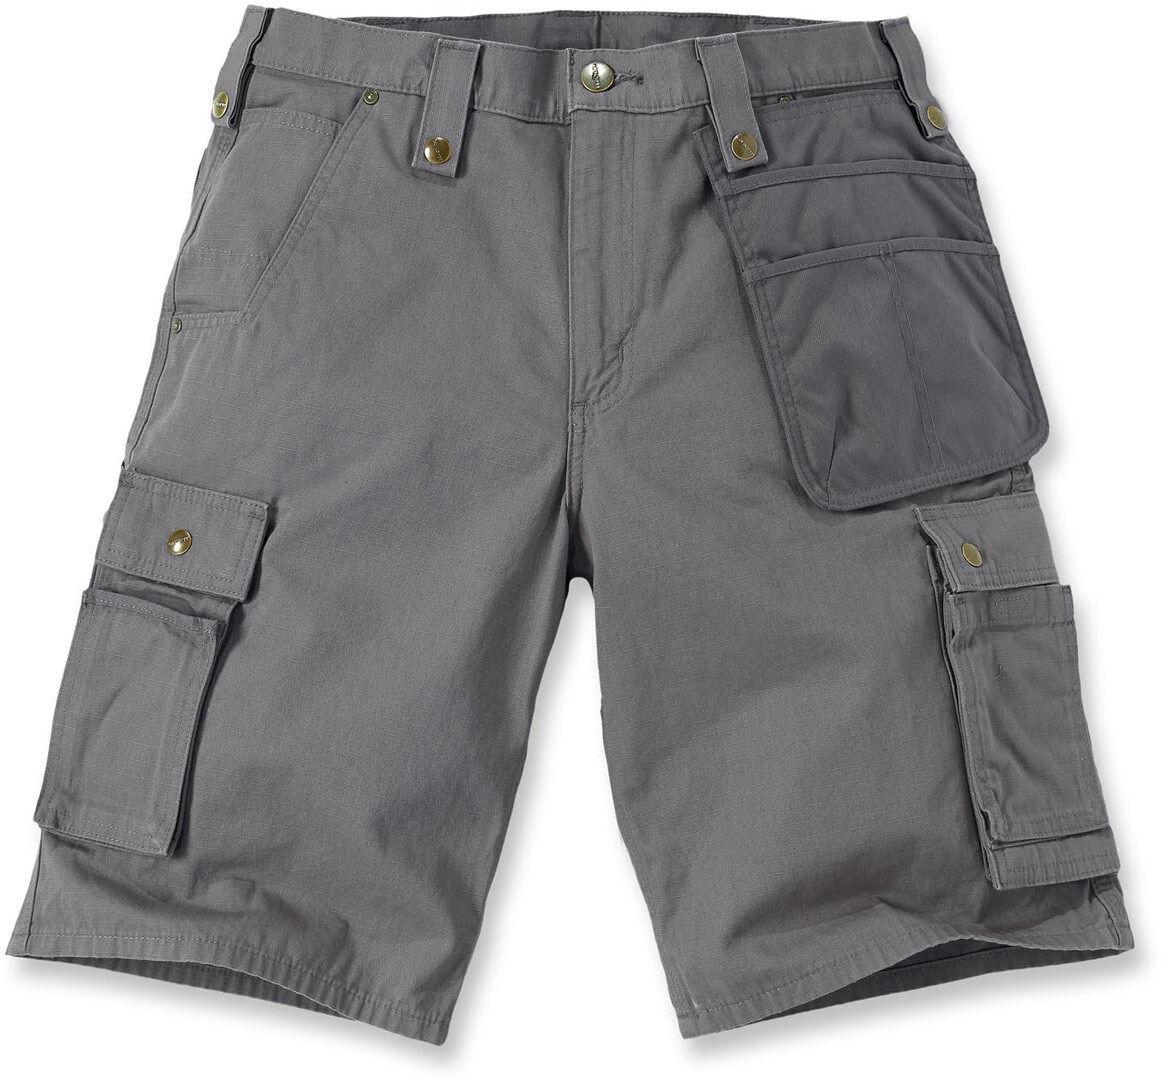 Carhartt Multi Pocket Ripstop Pantalones cortos Gris 42